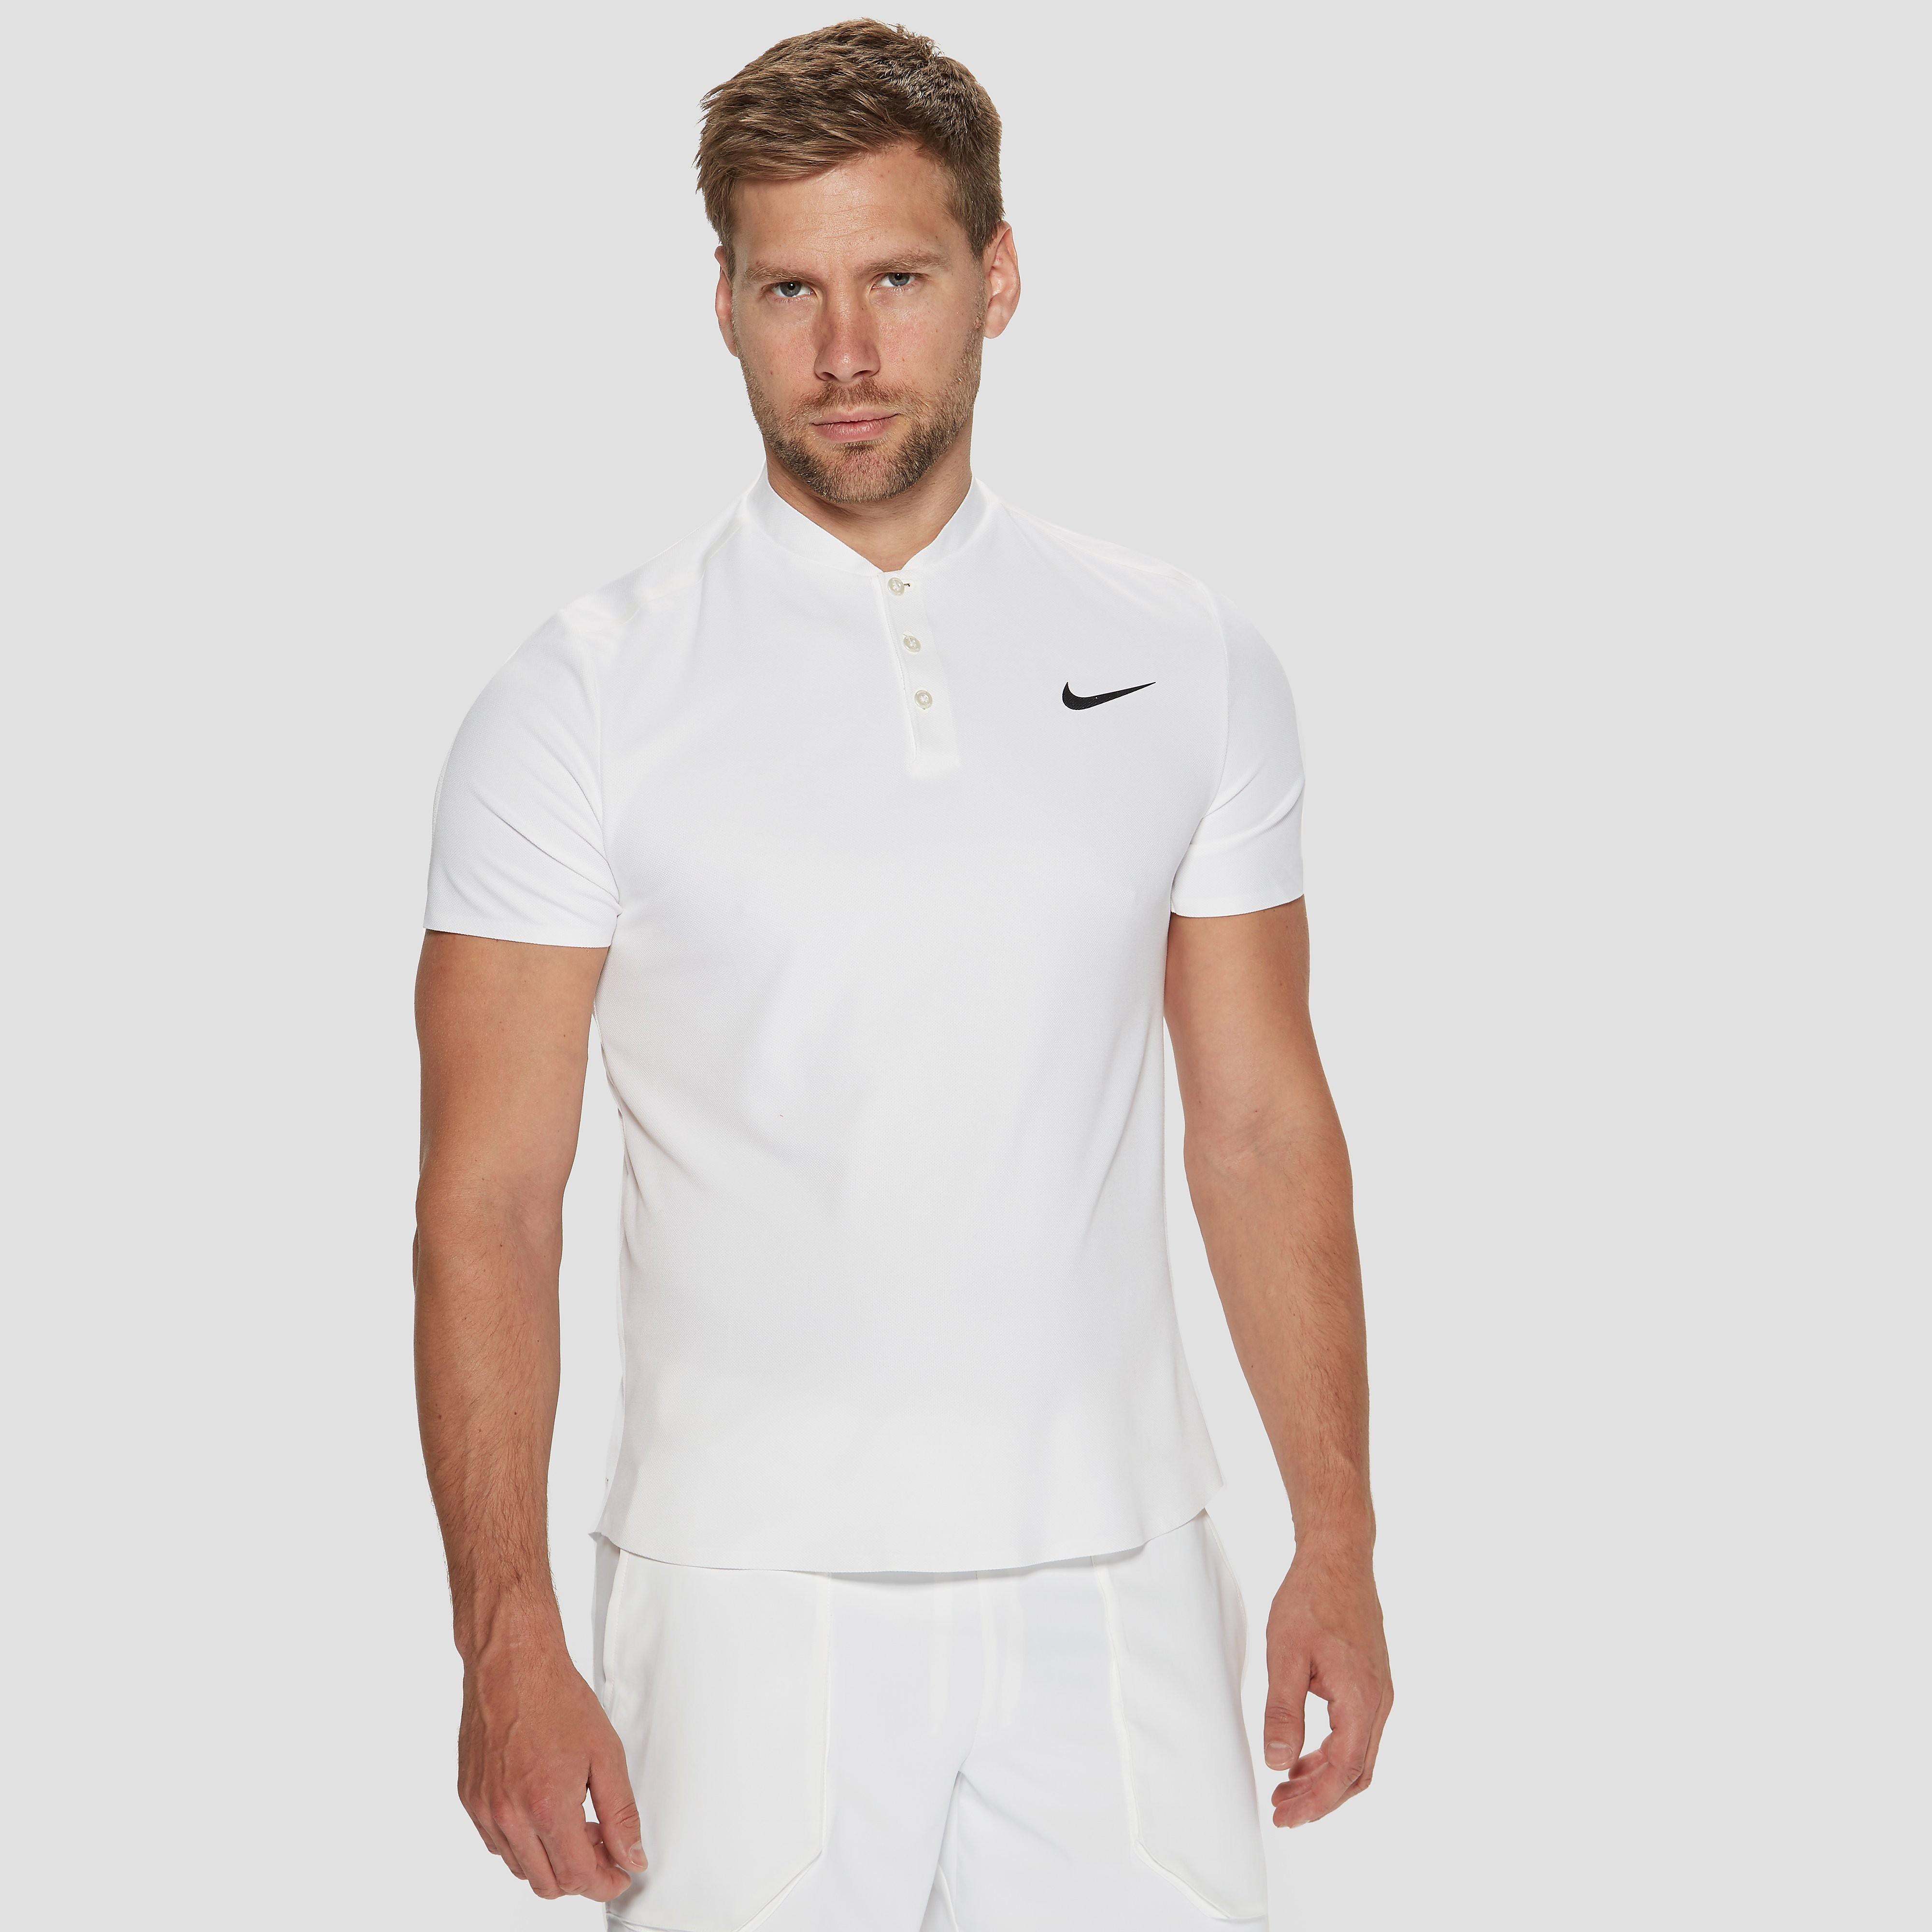 Nike RF Advantage Men's Tennis Polo Shirt